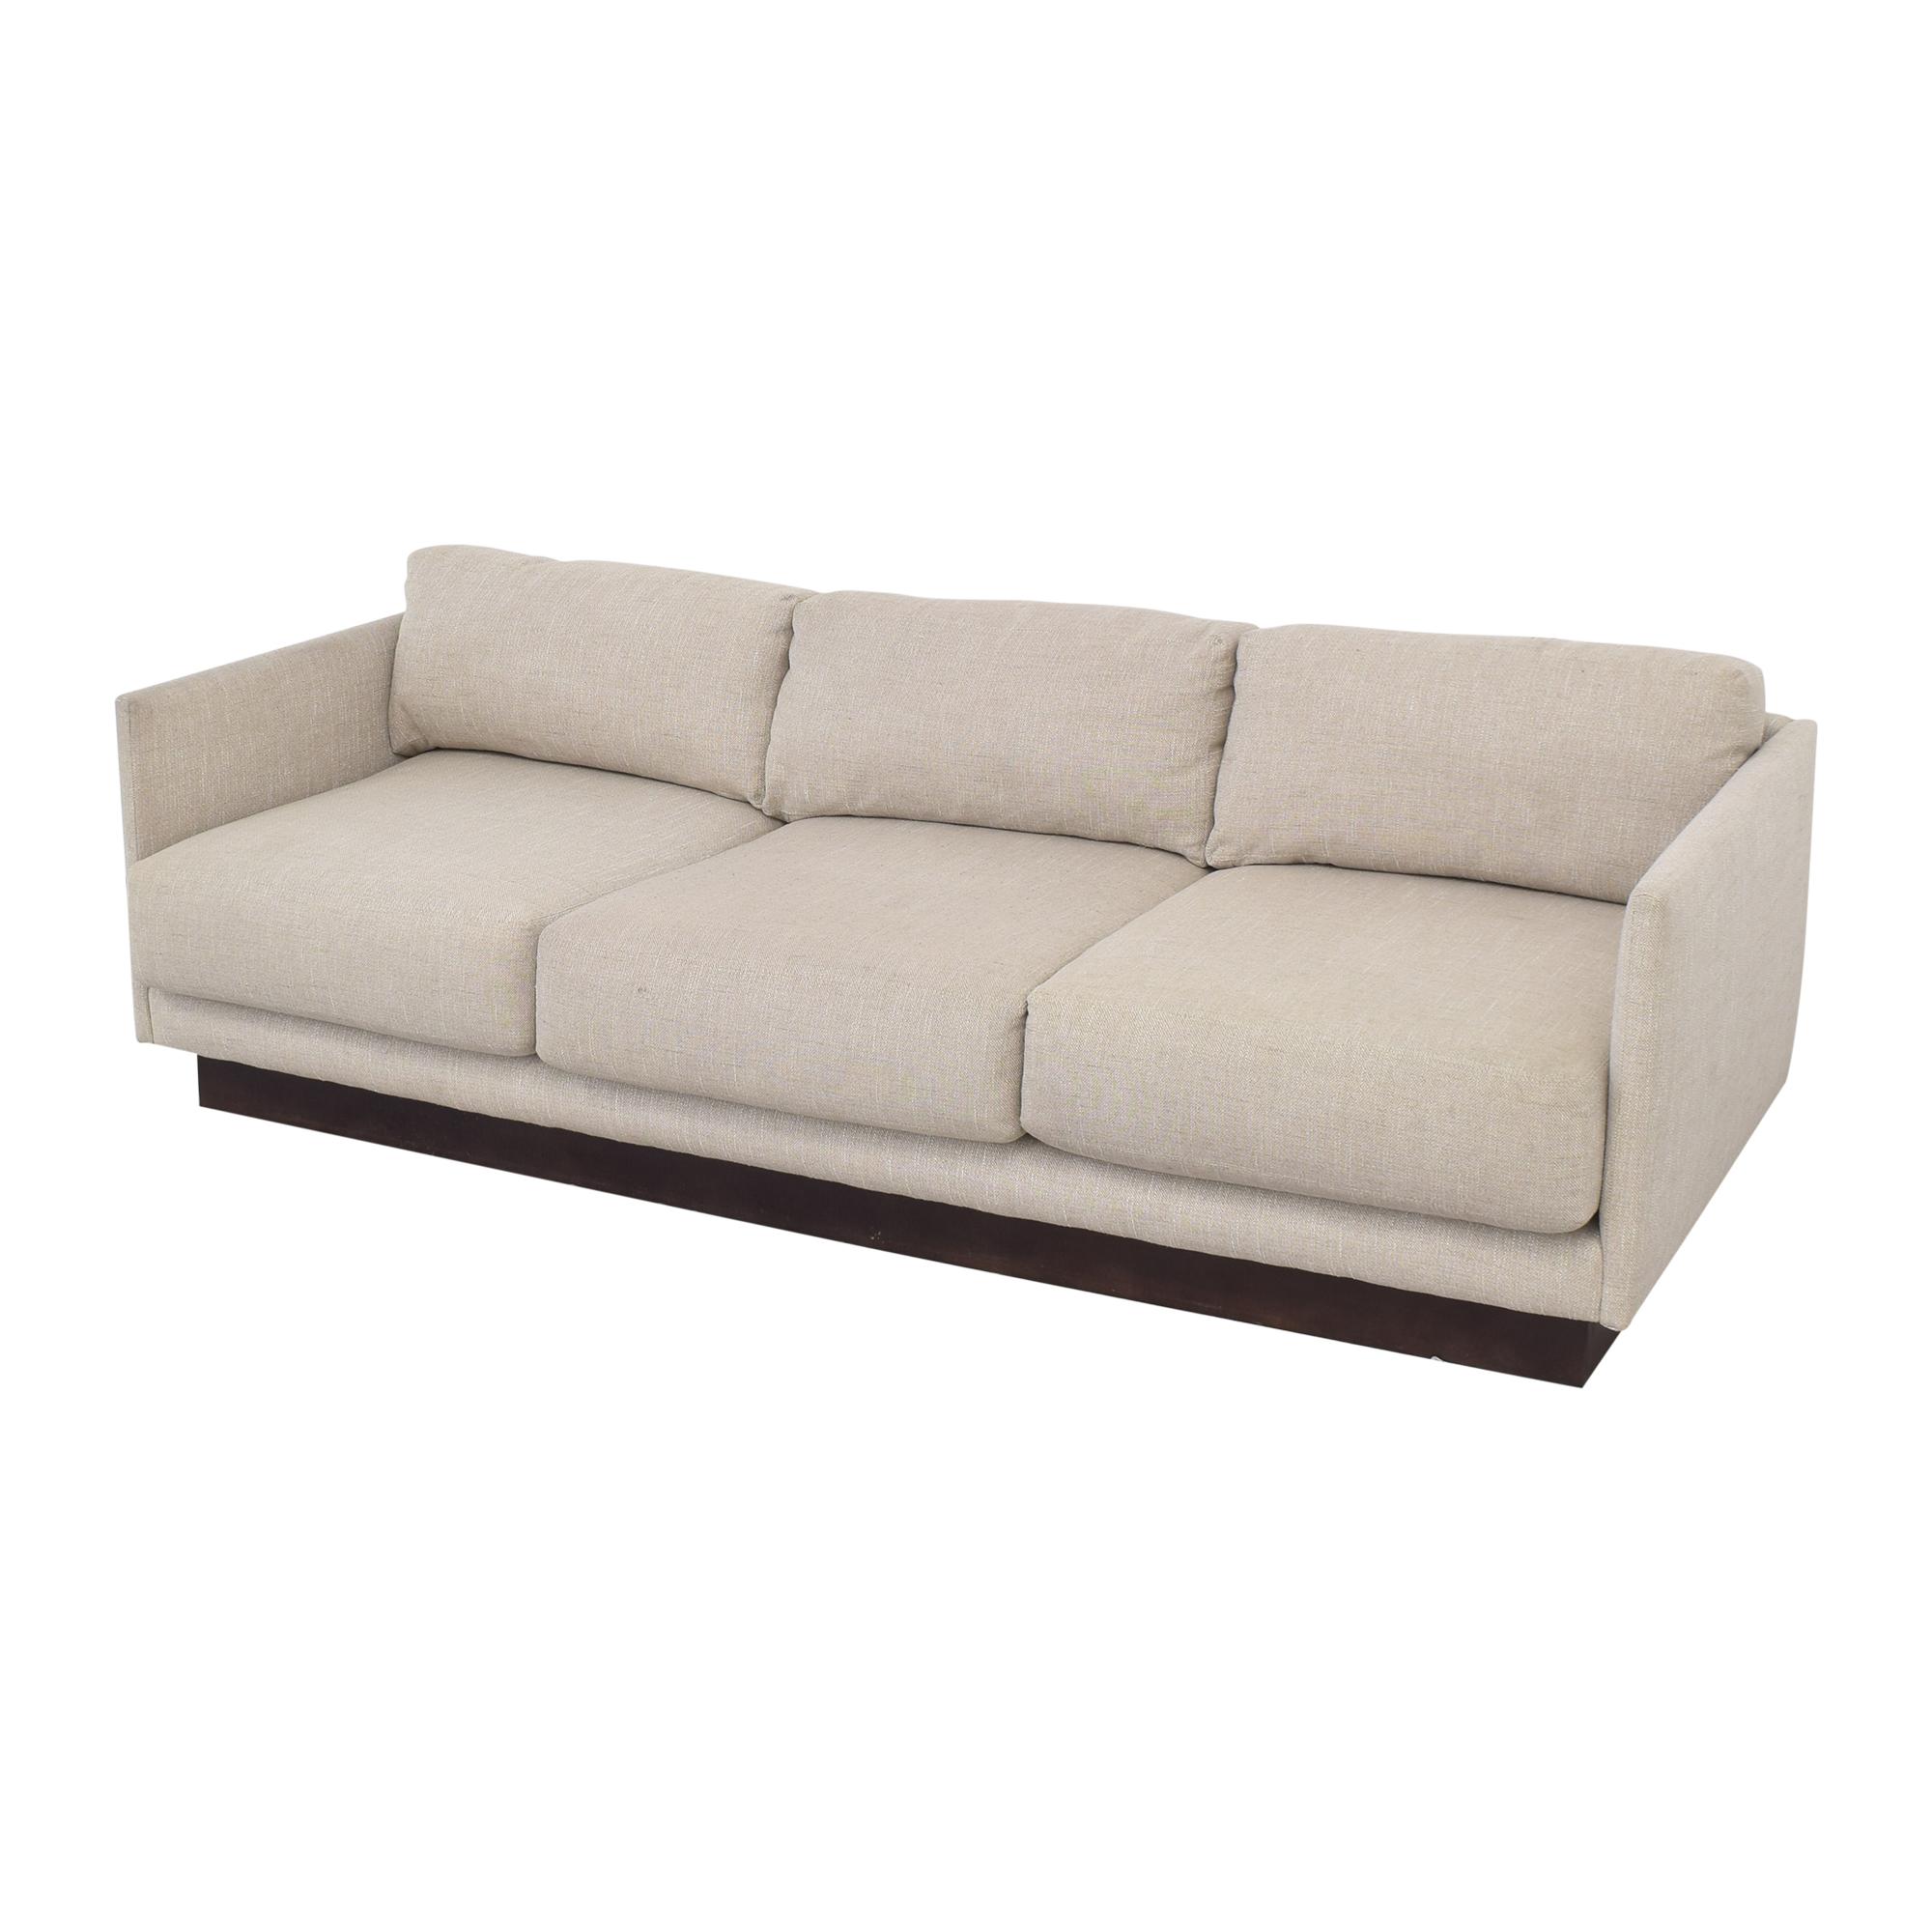 Mitchell Gold + Bob Williams Three Cushion Sofa sale